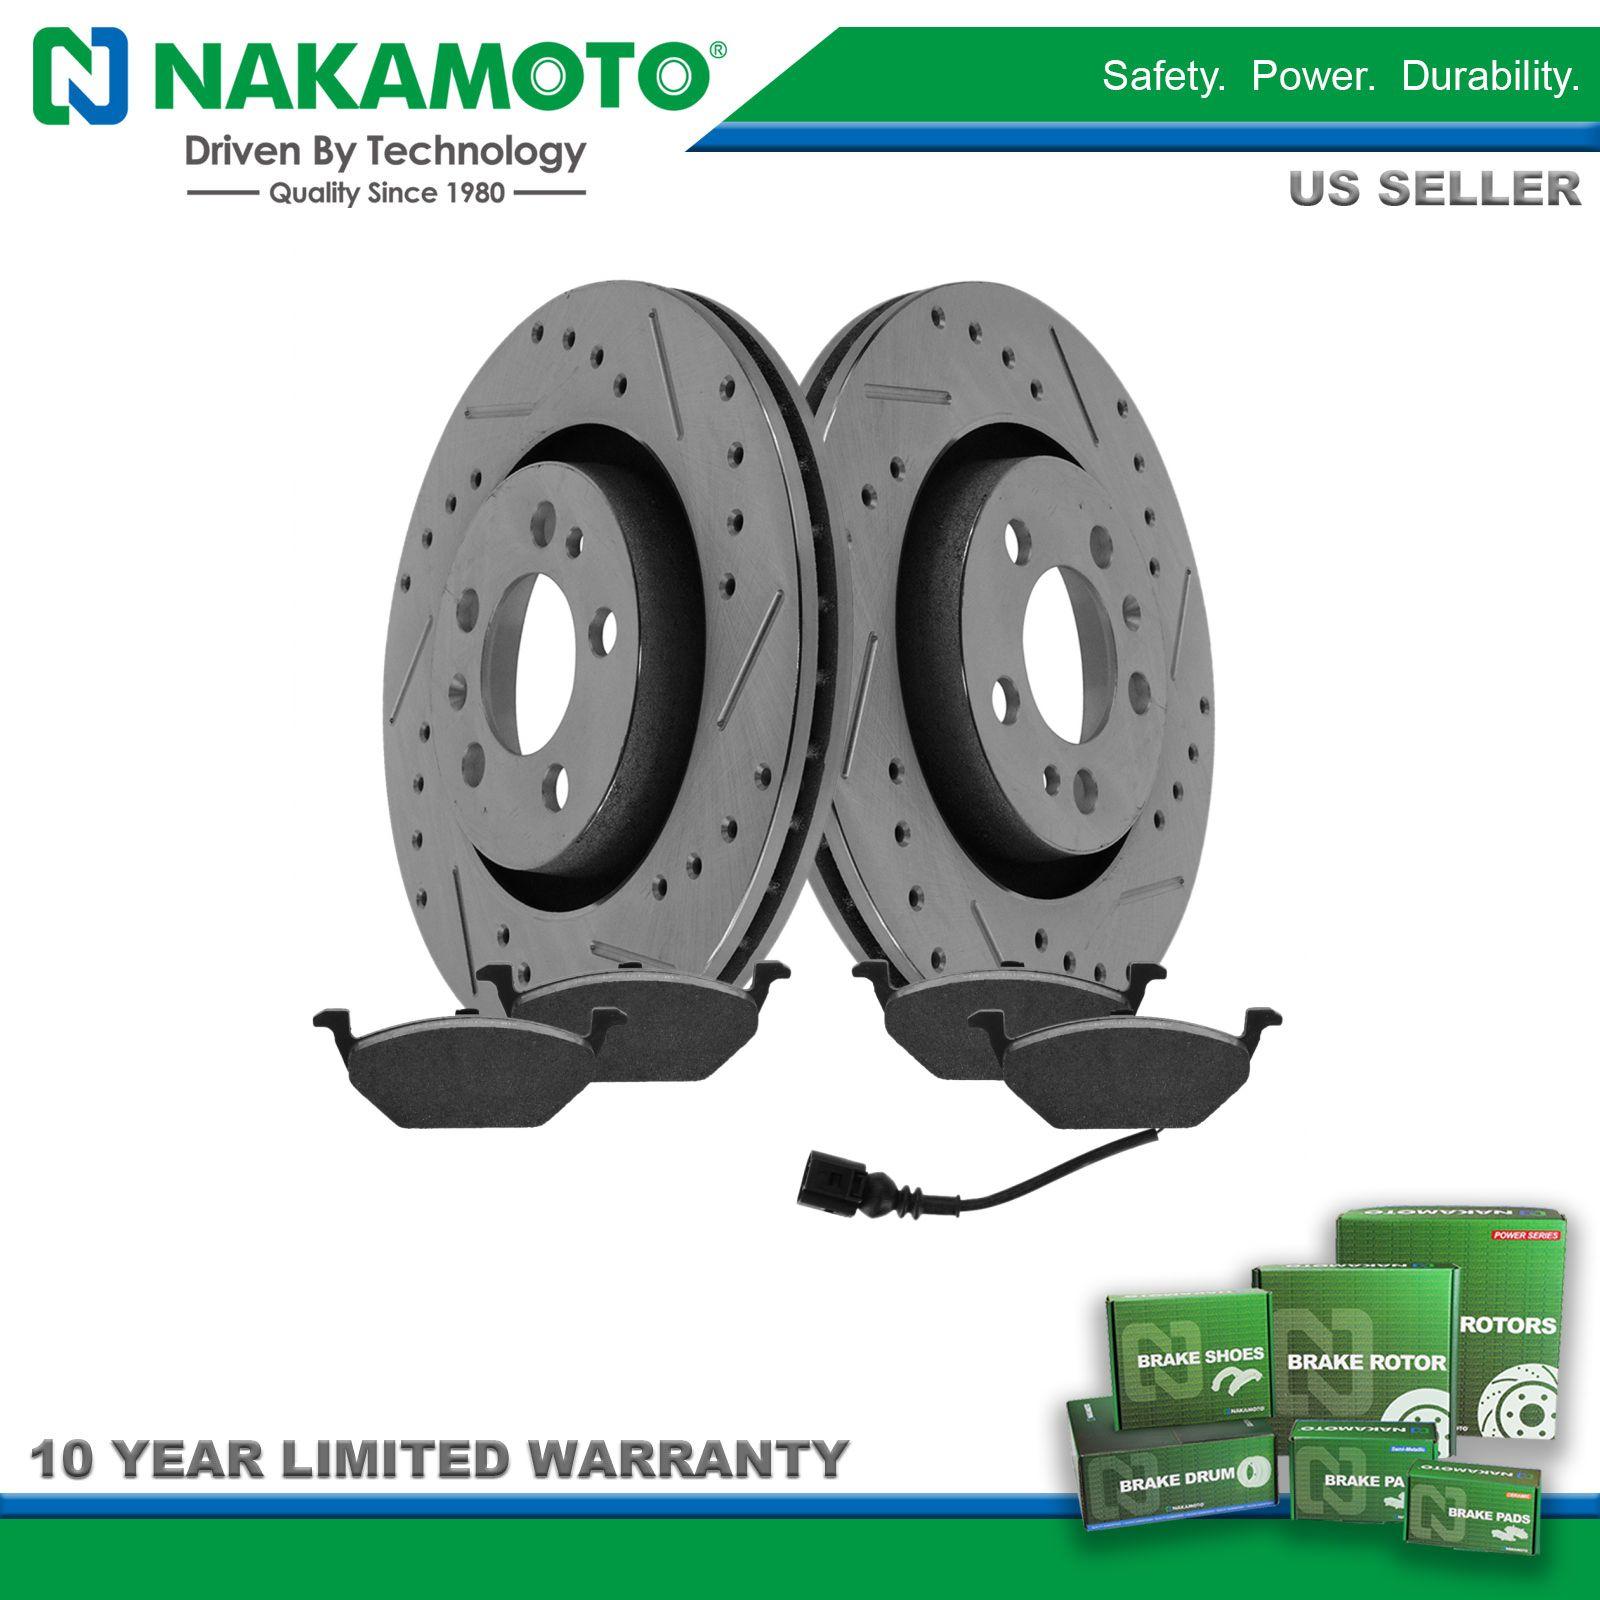 Nakamoto Front Performance Drilled /& Slotted Brake Rotor /& Posi Ceramic Pad Set